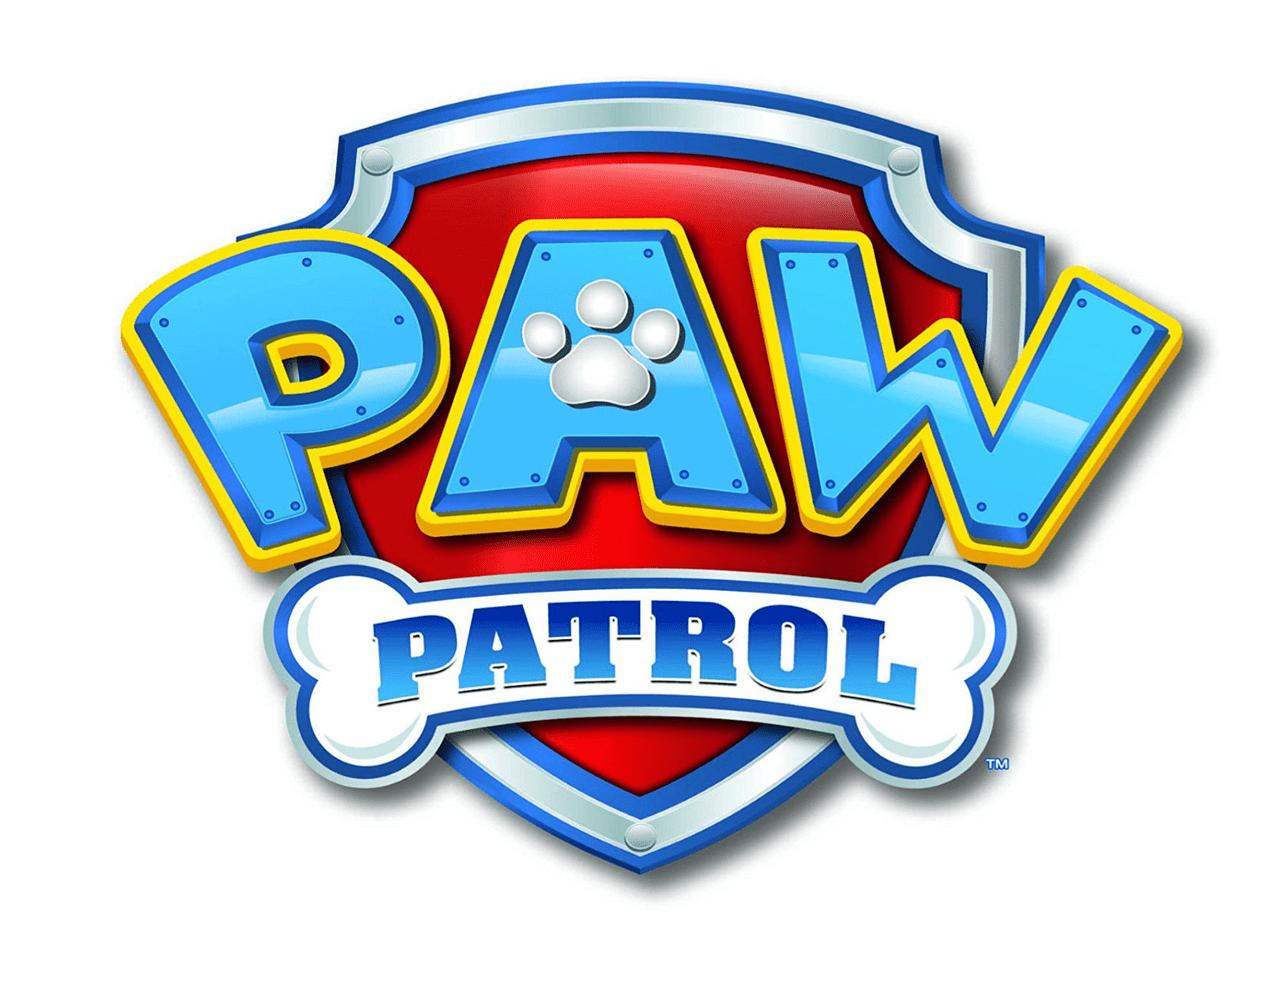 paw patrol logo 1 4 sheet edible birthday cake topper